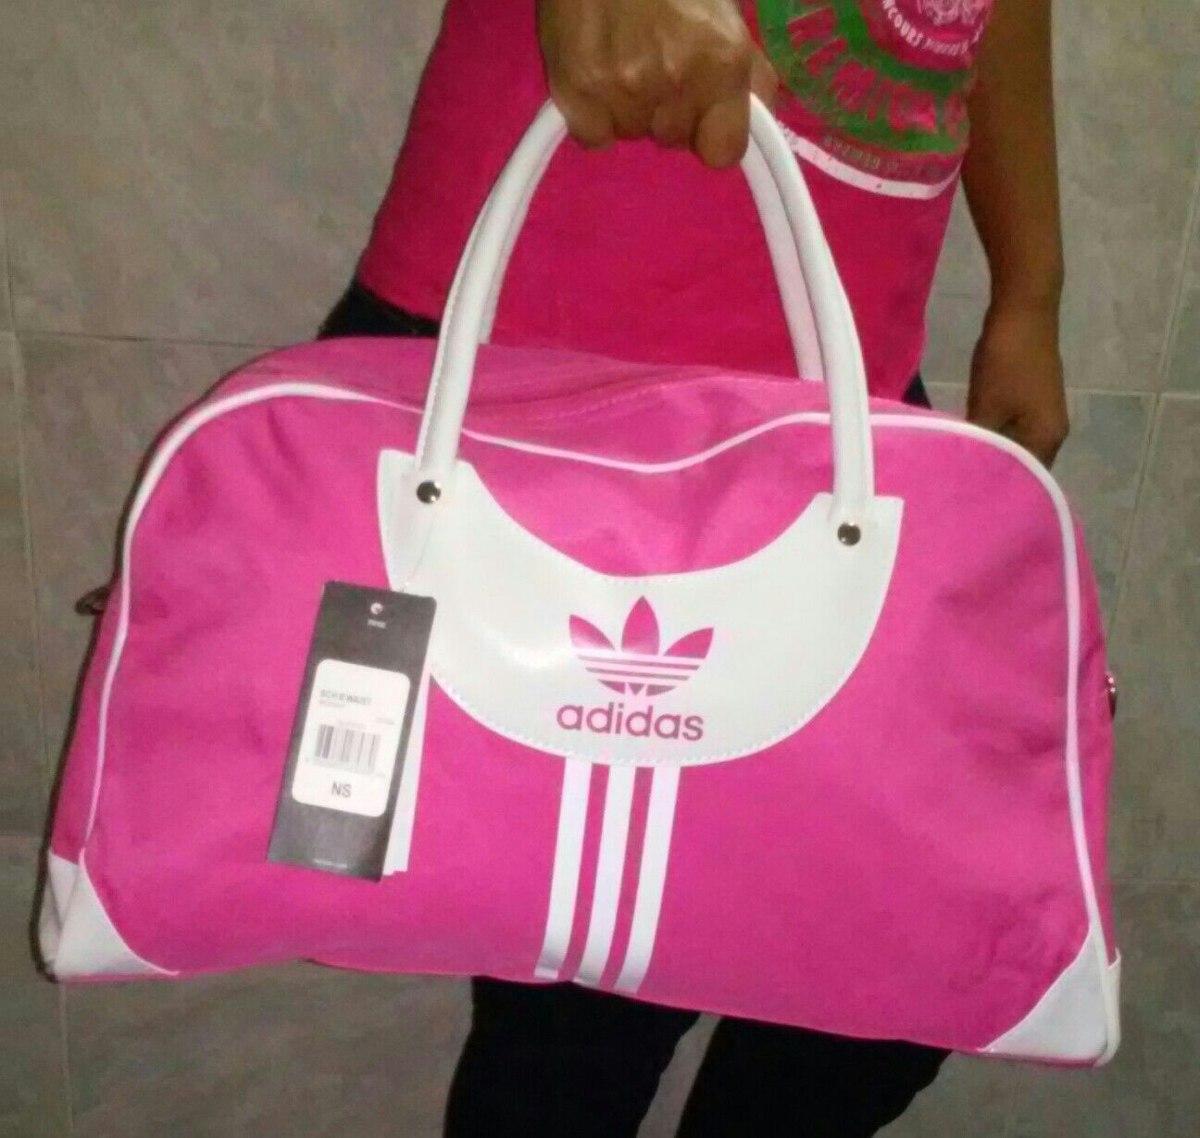 adidas bolsos deportivos mujer